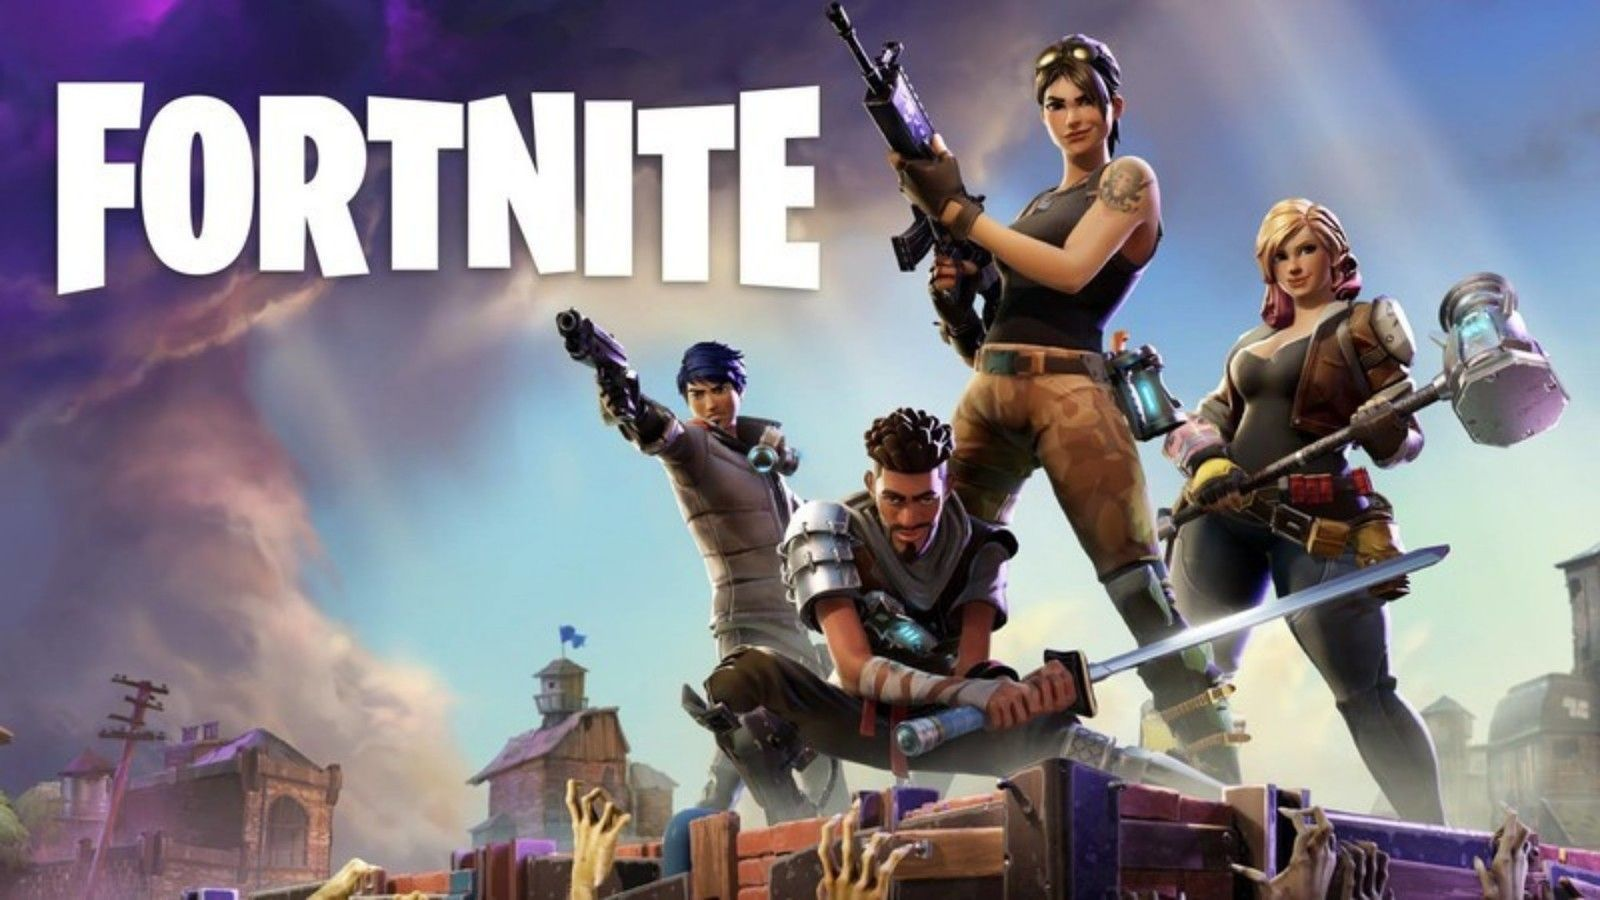 Fortnite Video Game